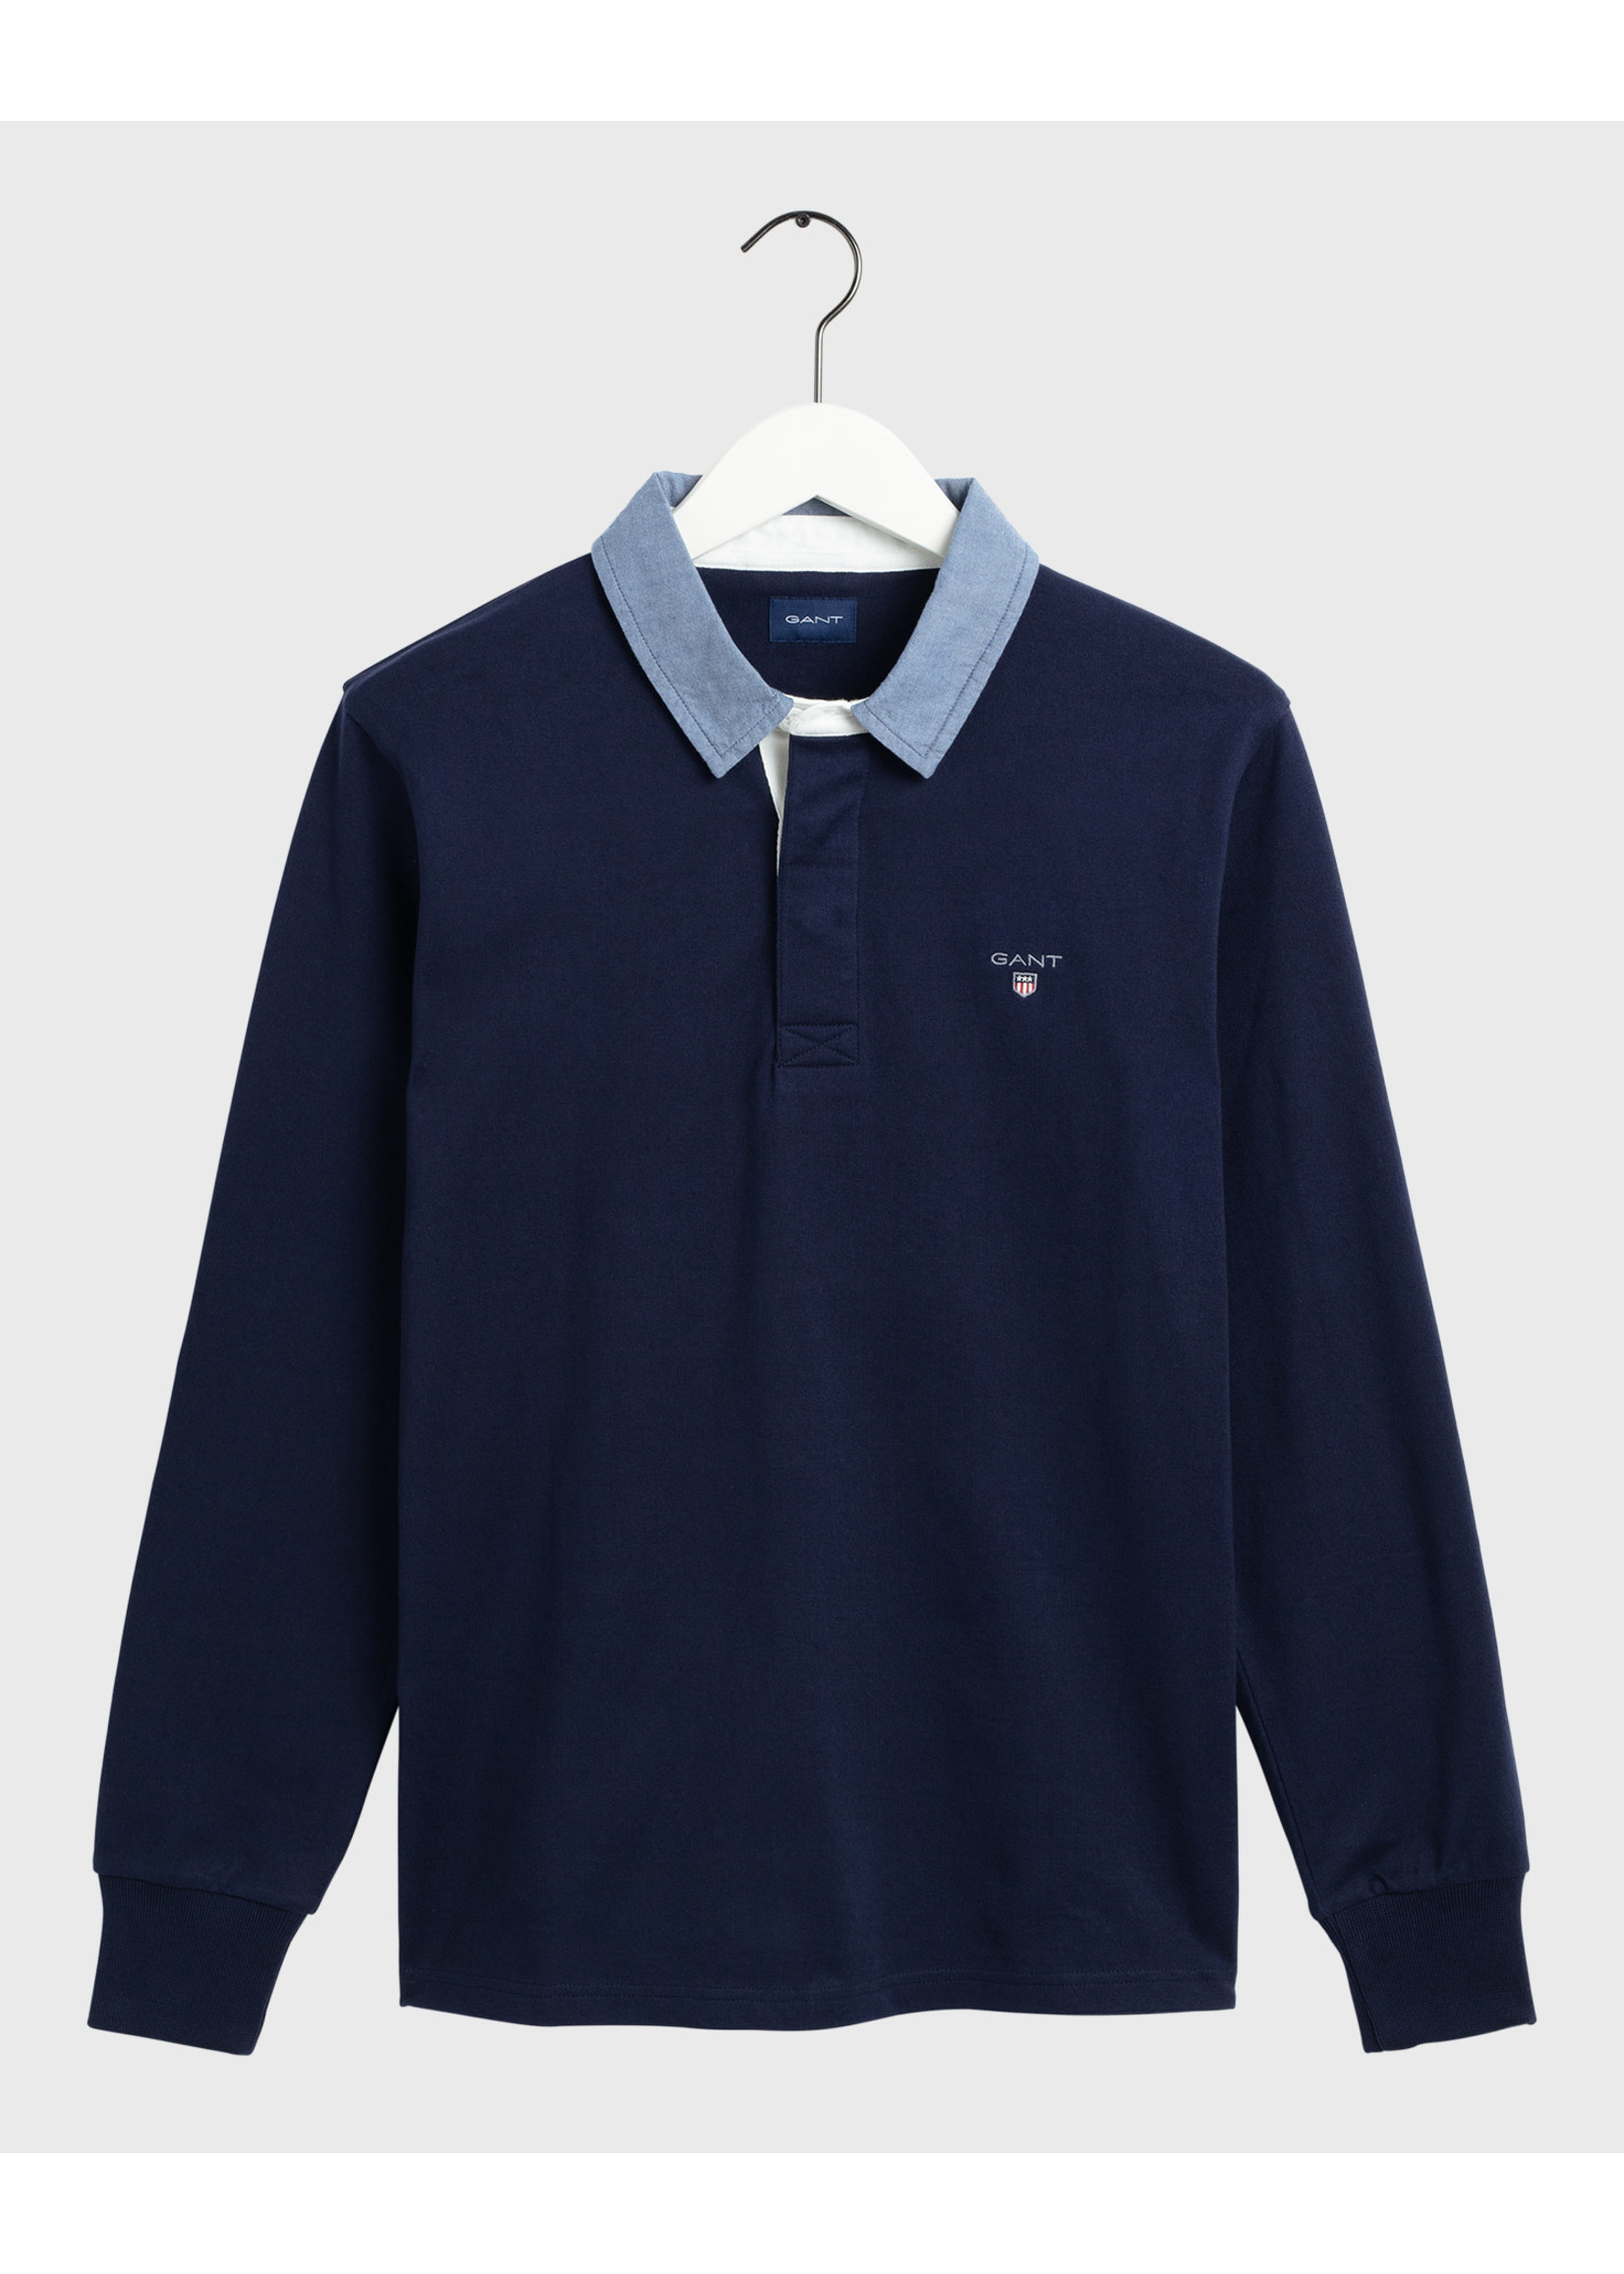 GANT sweatshirt marine